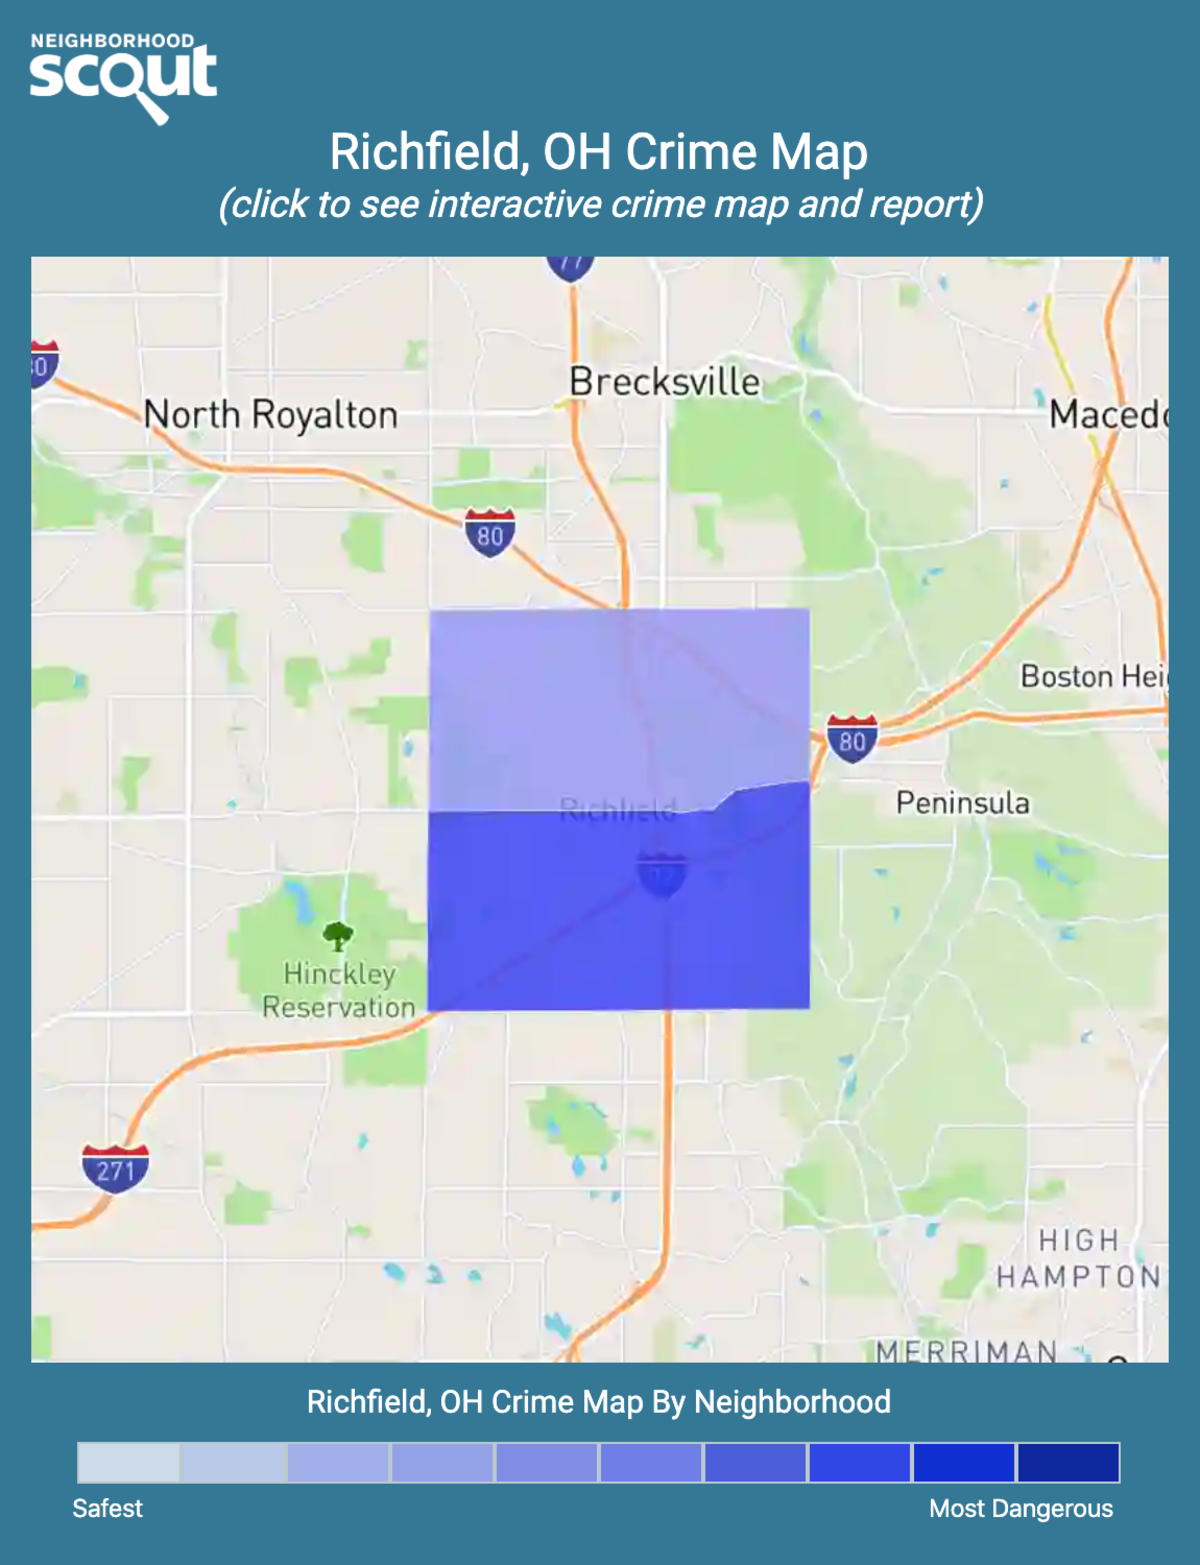 Richfield, Ohio crime map